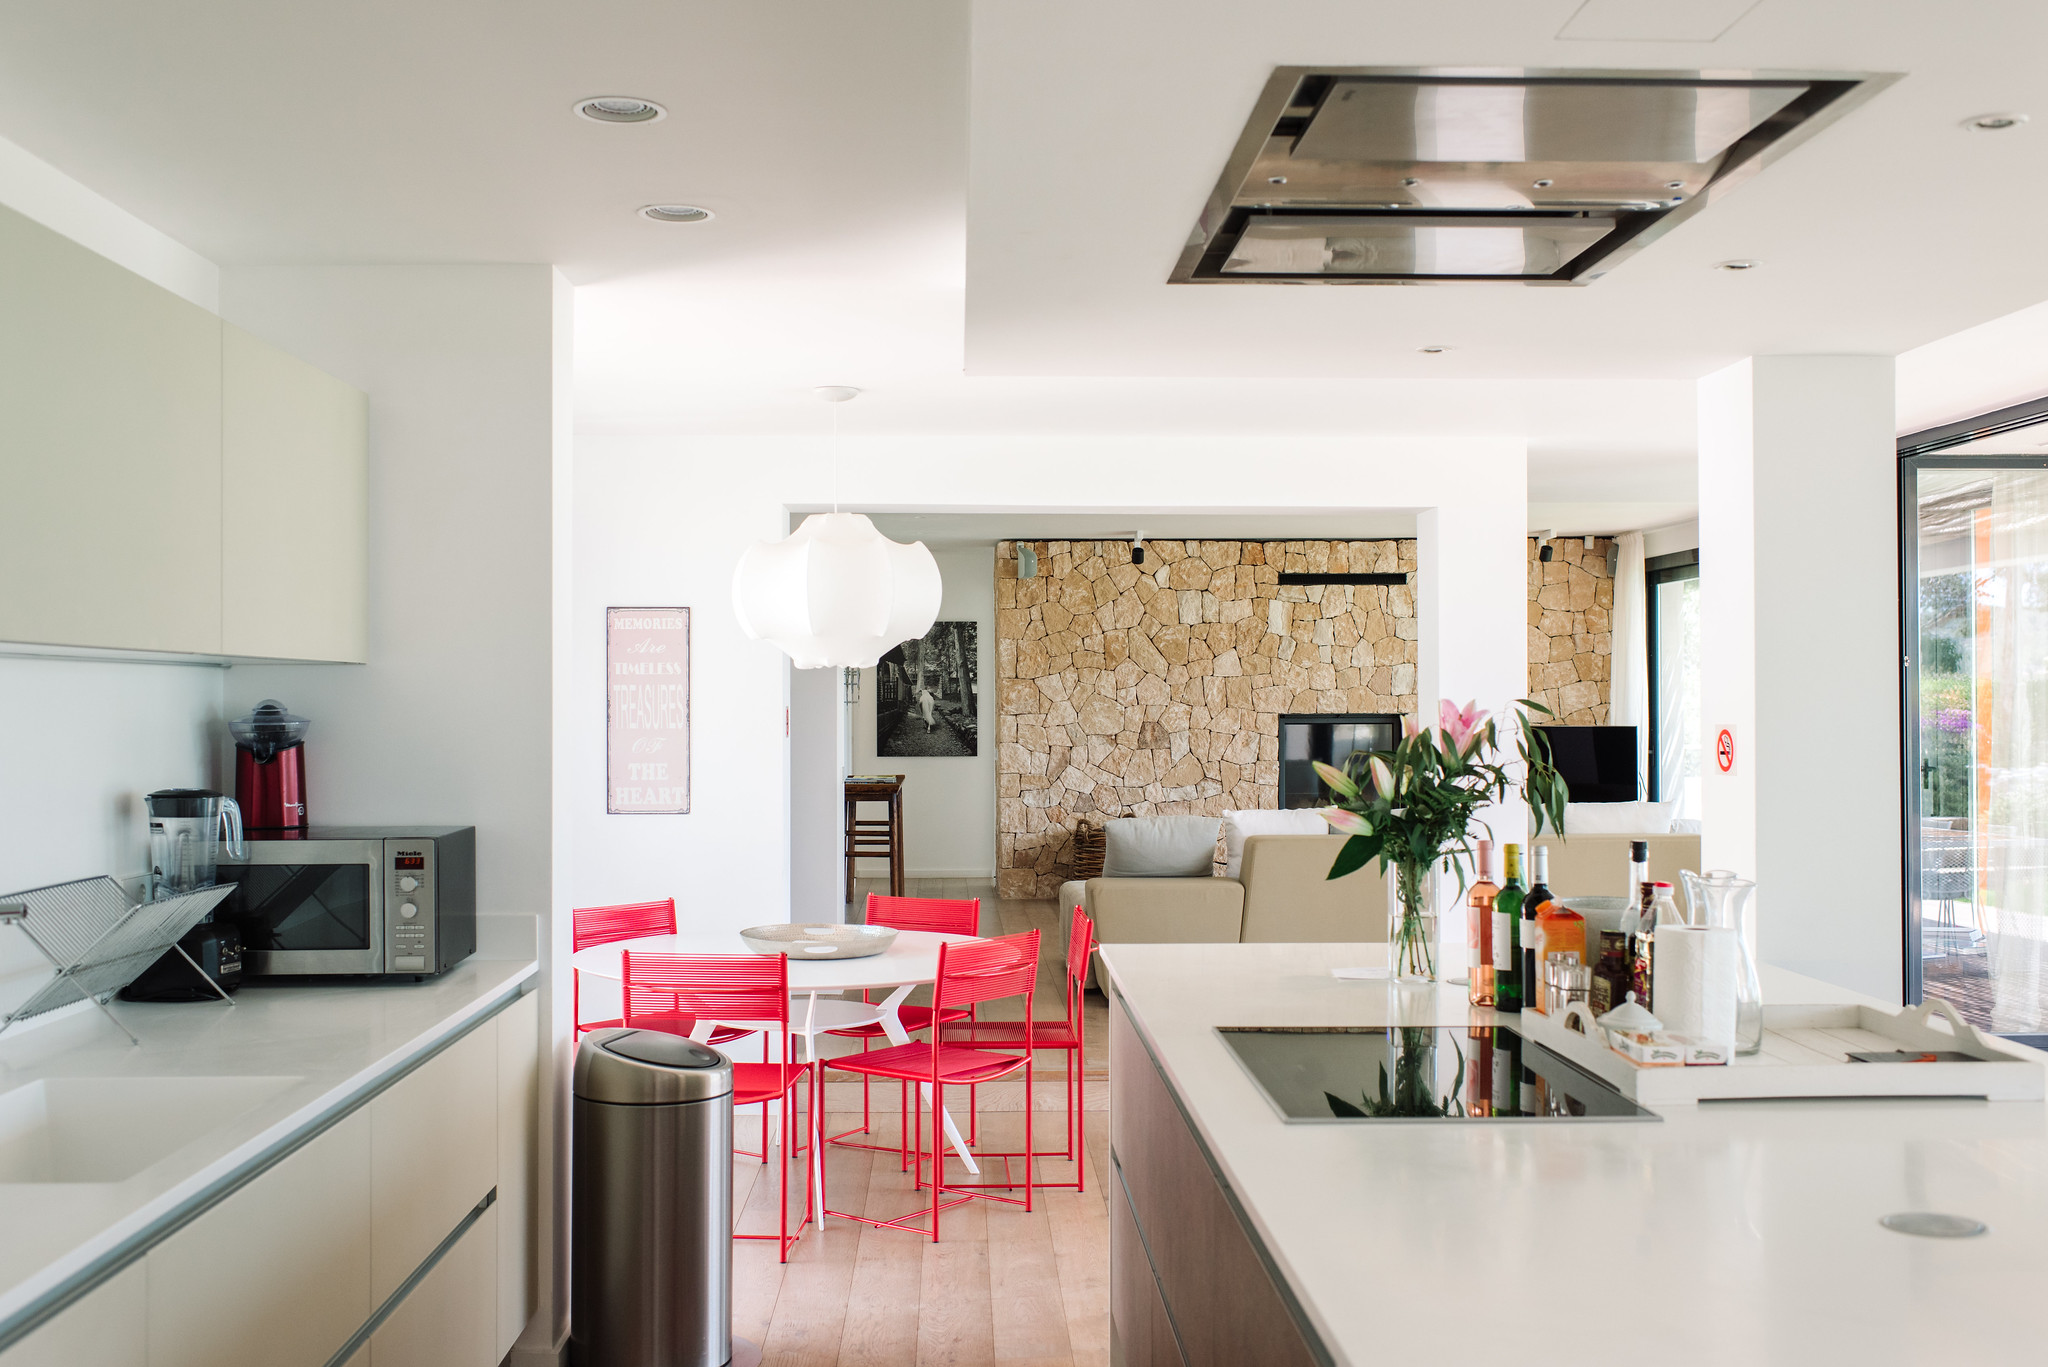 https://www.white-ibiza.com/wp-content/uploads/2020/06/white-ibiza-villas-can-jondal-interior-kitchen2-1.jpg